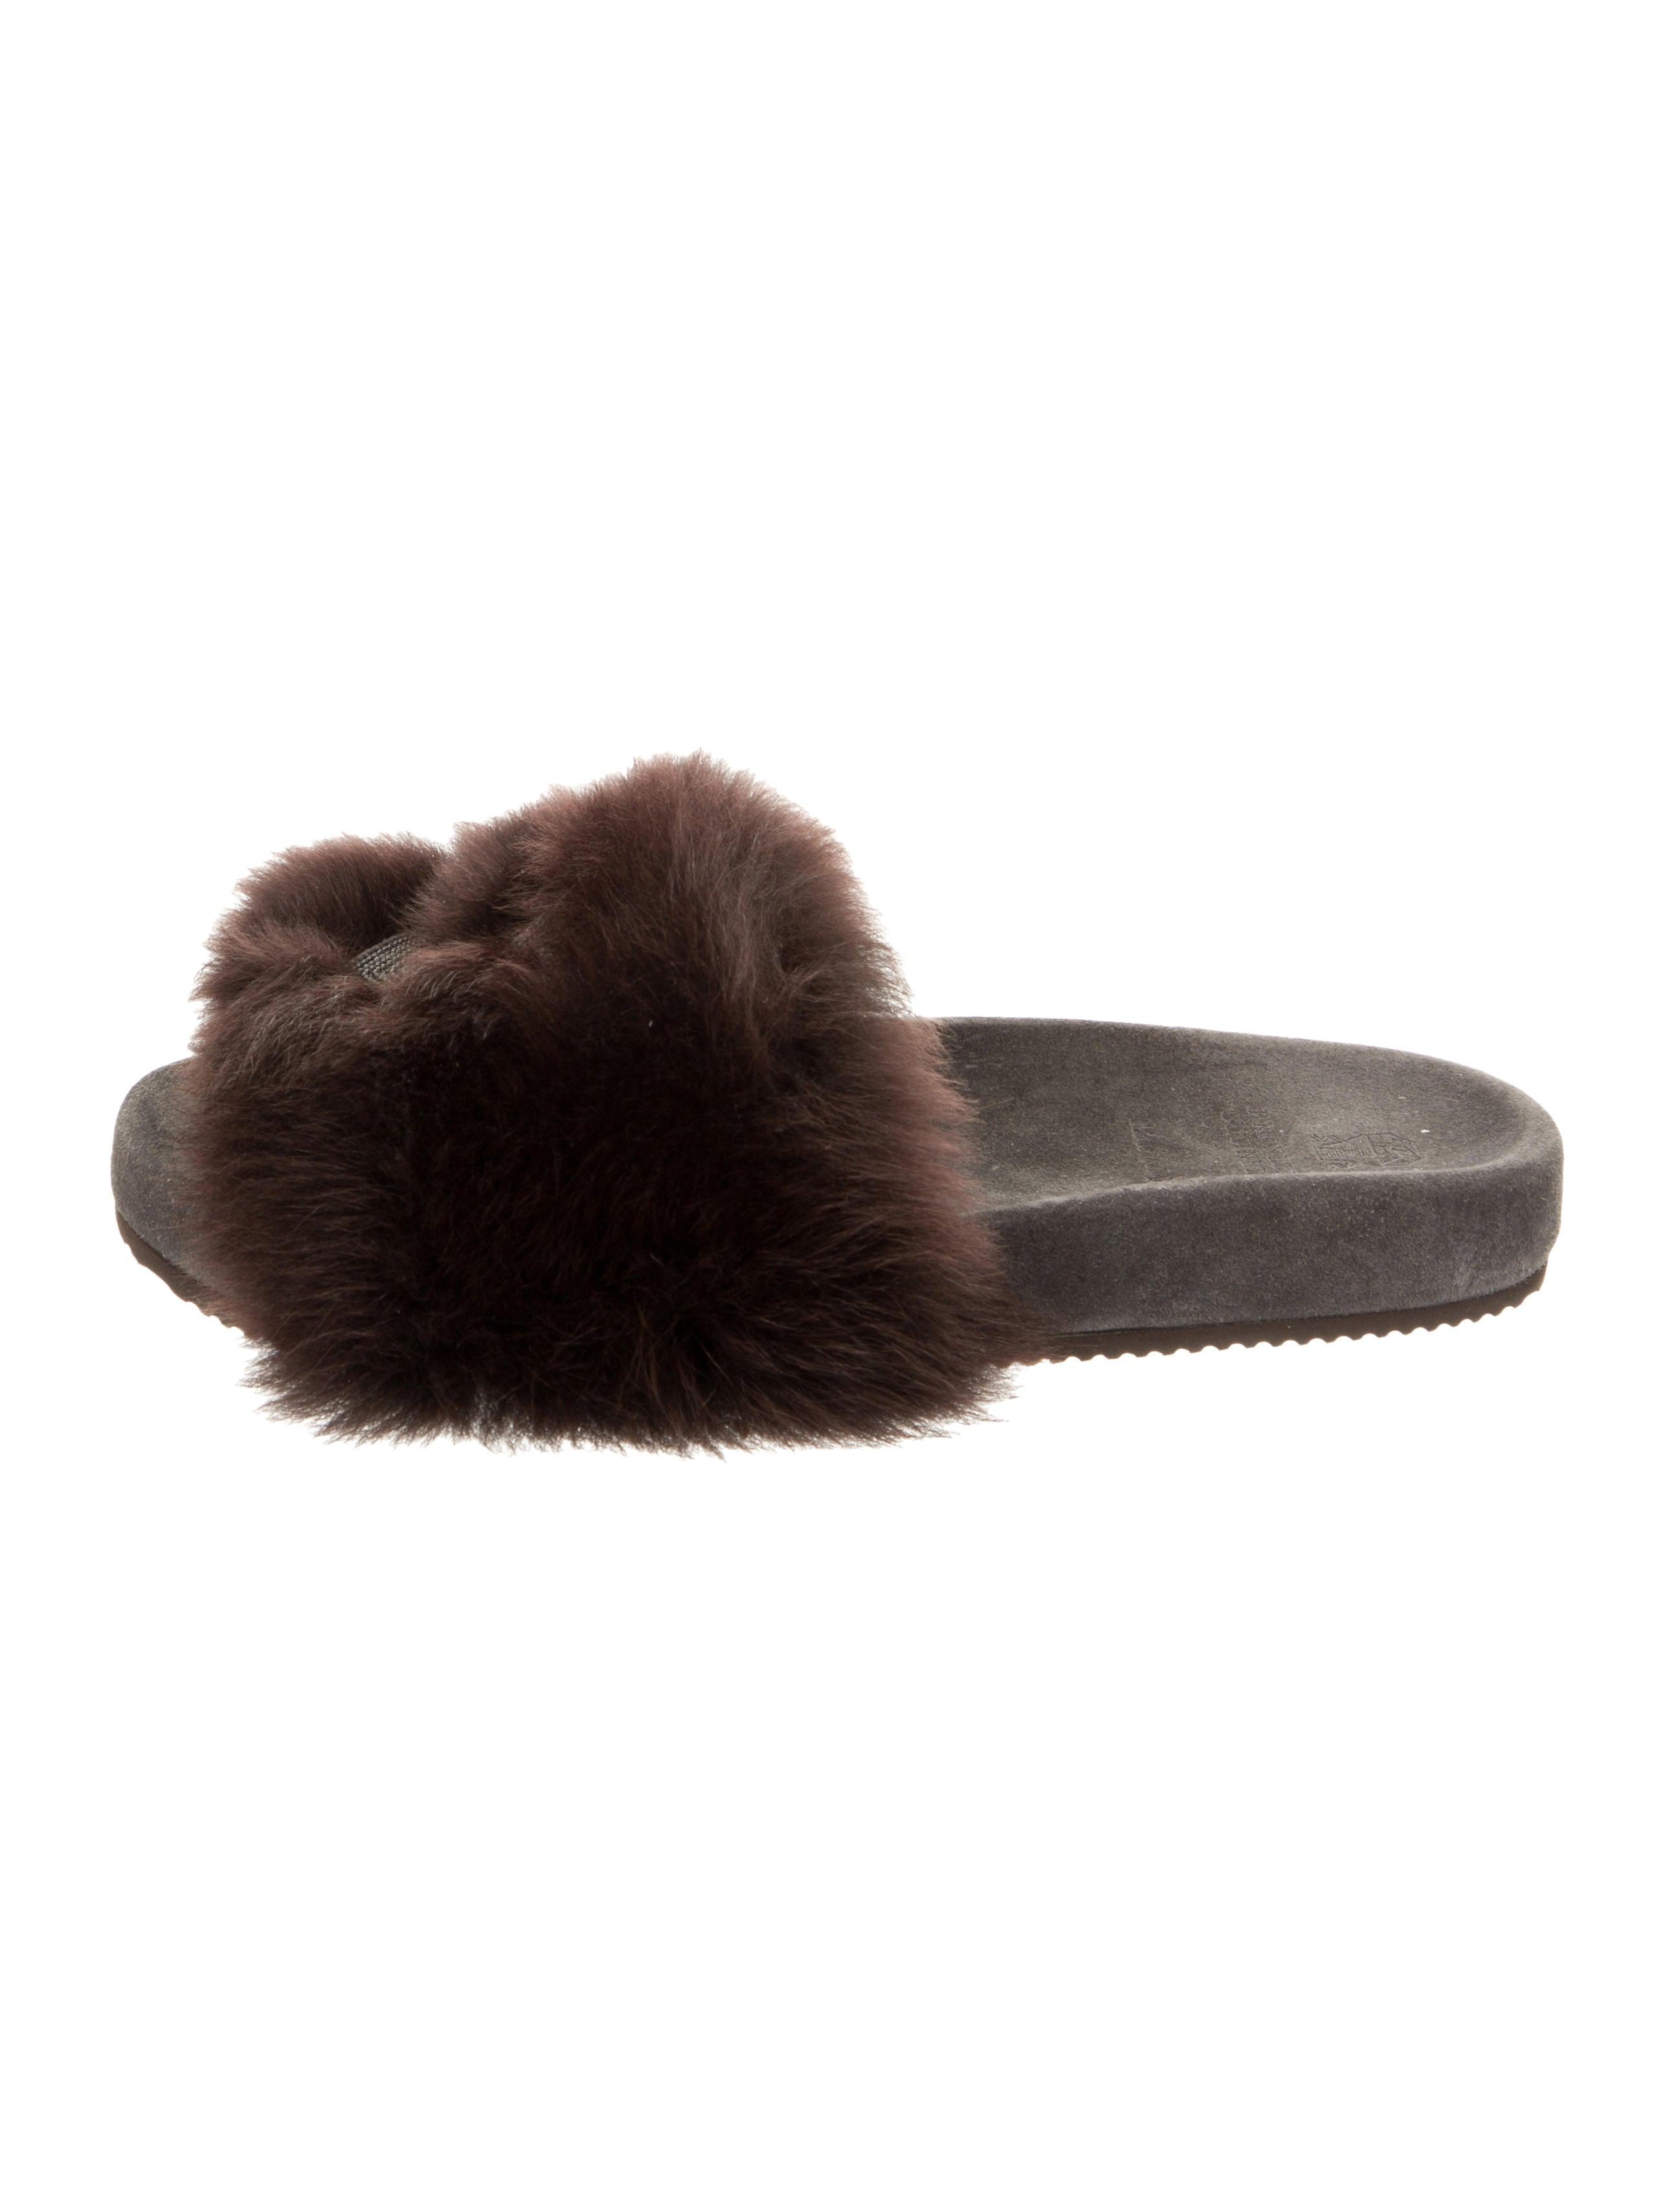 Brunello Cucinelli Monili Fur Trimmed Slide Sandals